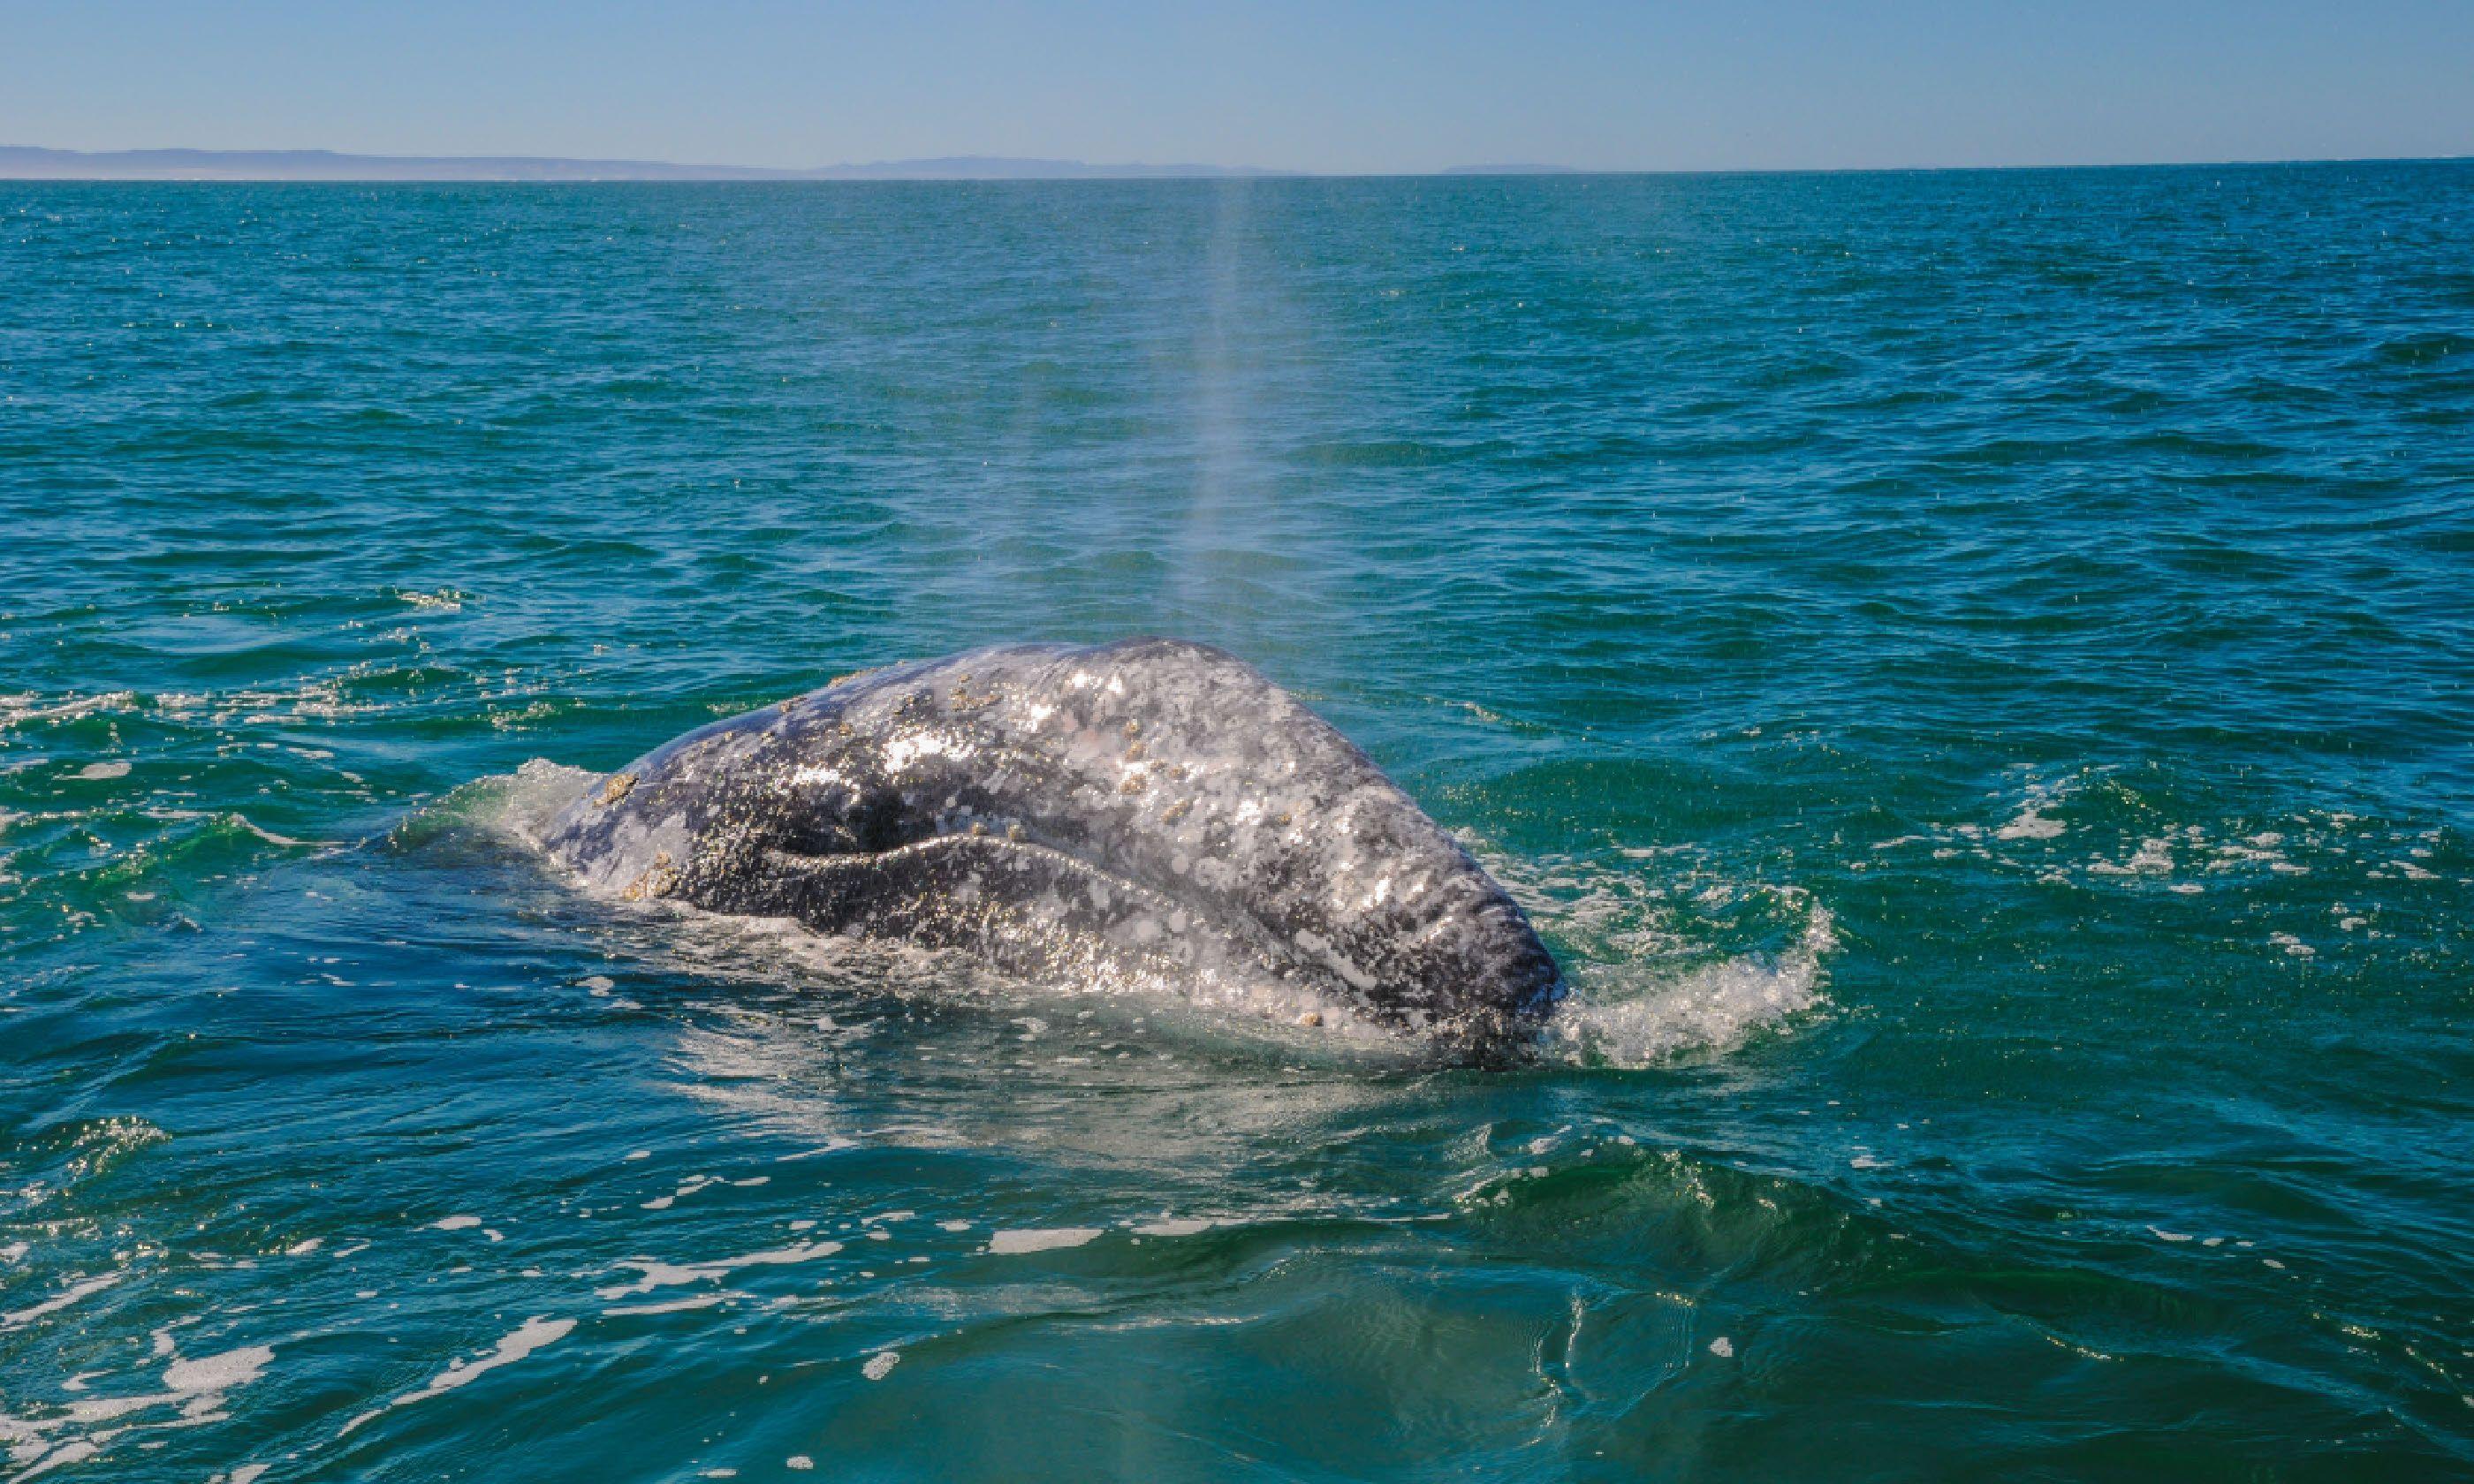 Gray whale in Guerrero Negro bay, Mexico (Shutterstock)